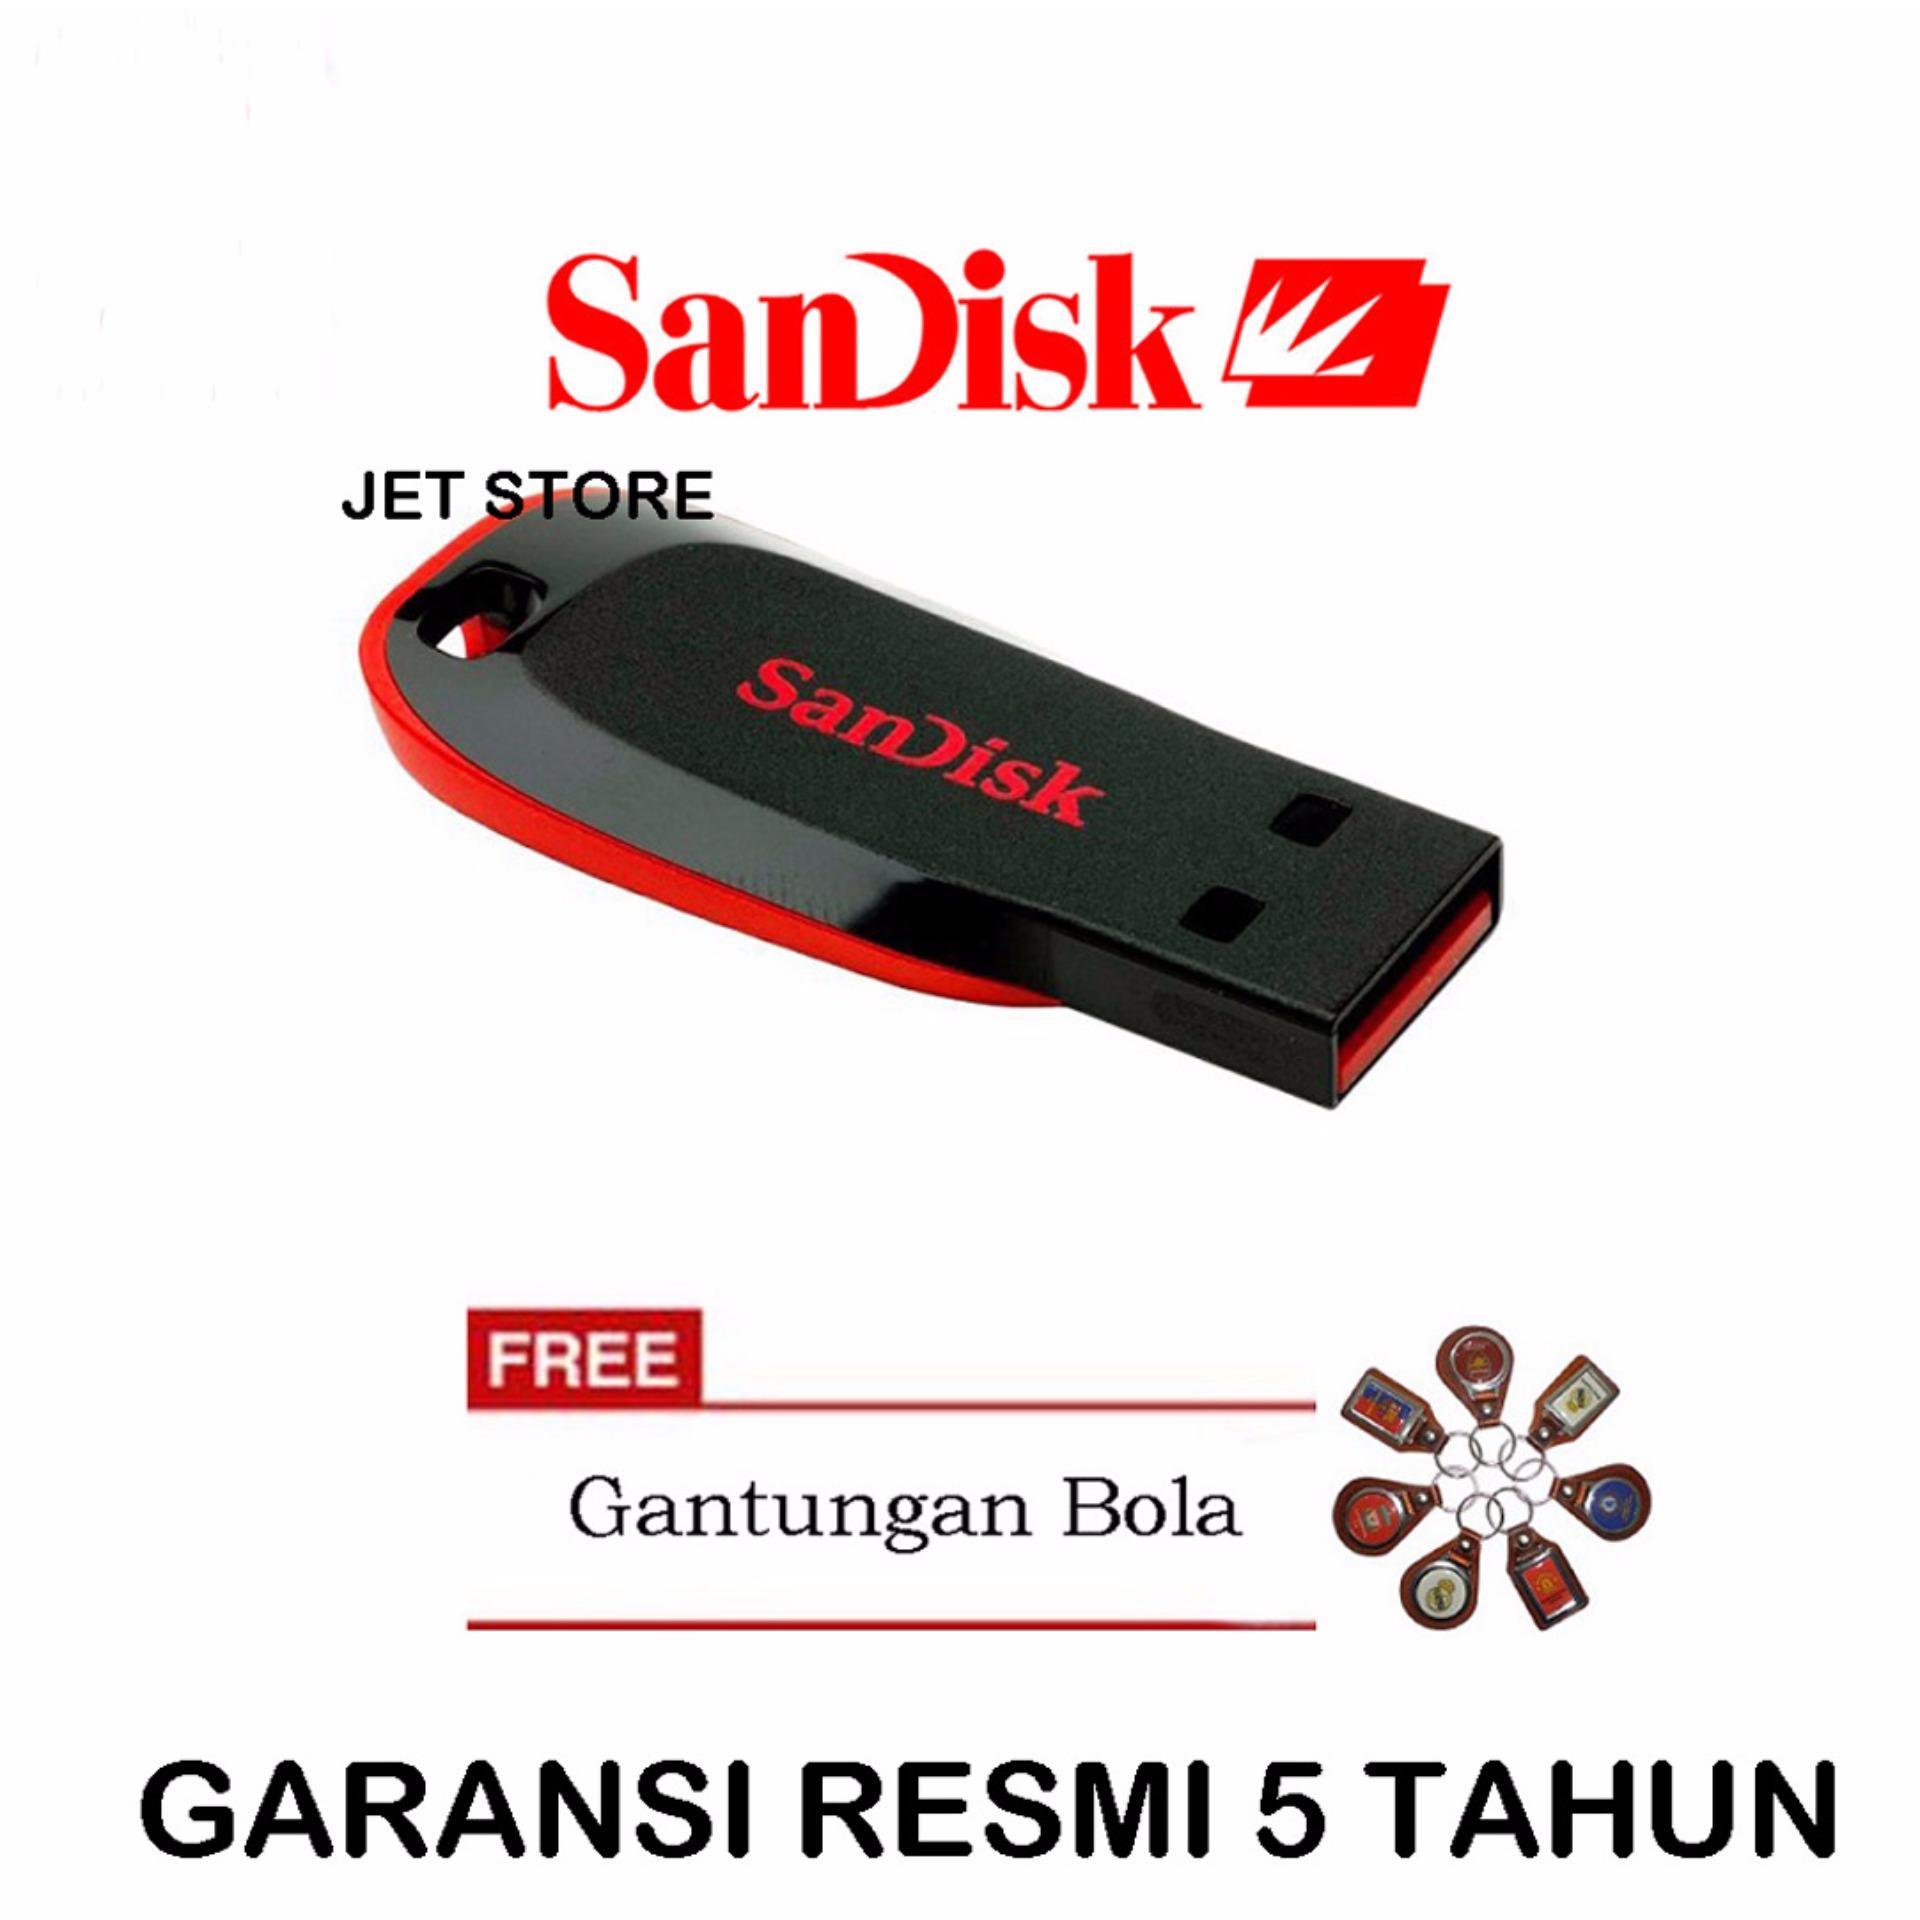 Jual Sandisk Flash Disk Usb 8Gb Cruzer Blade Cz50 Hitam Gantungan Bola Baru